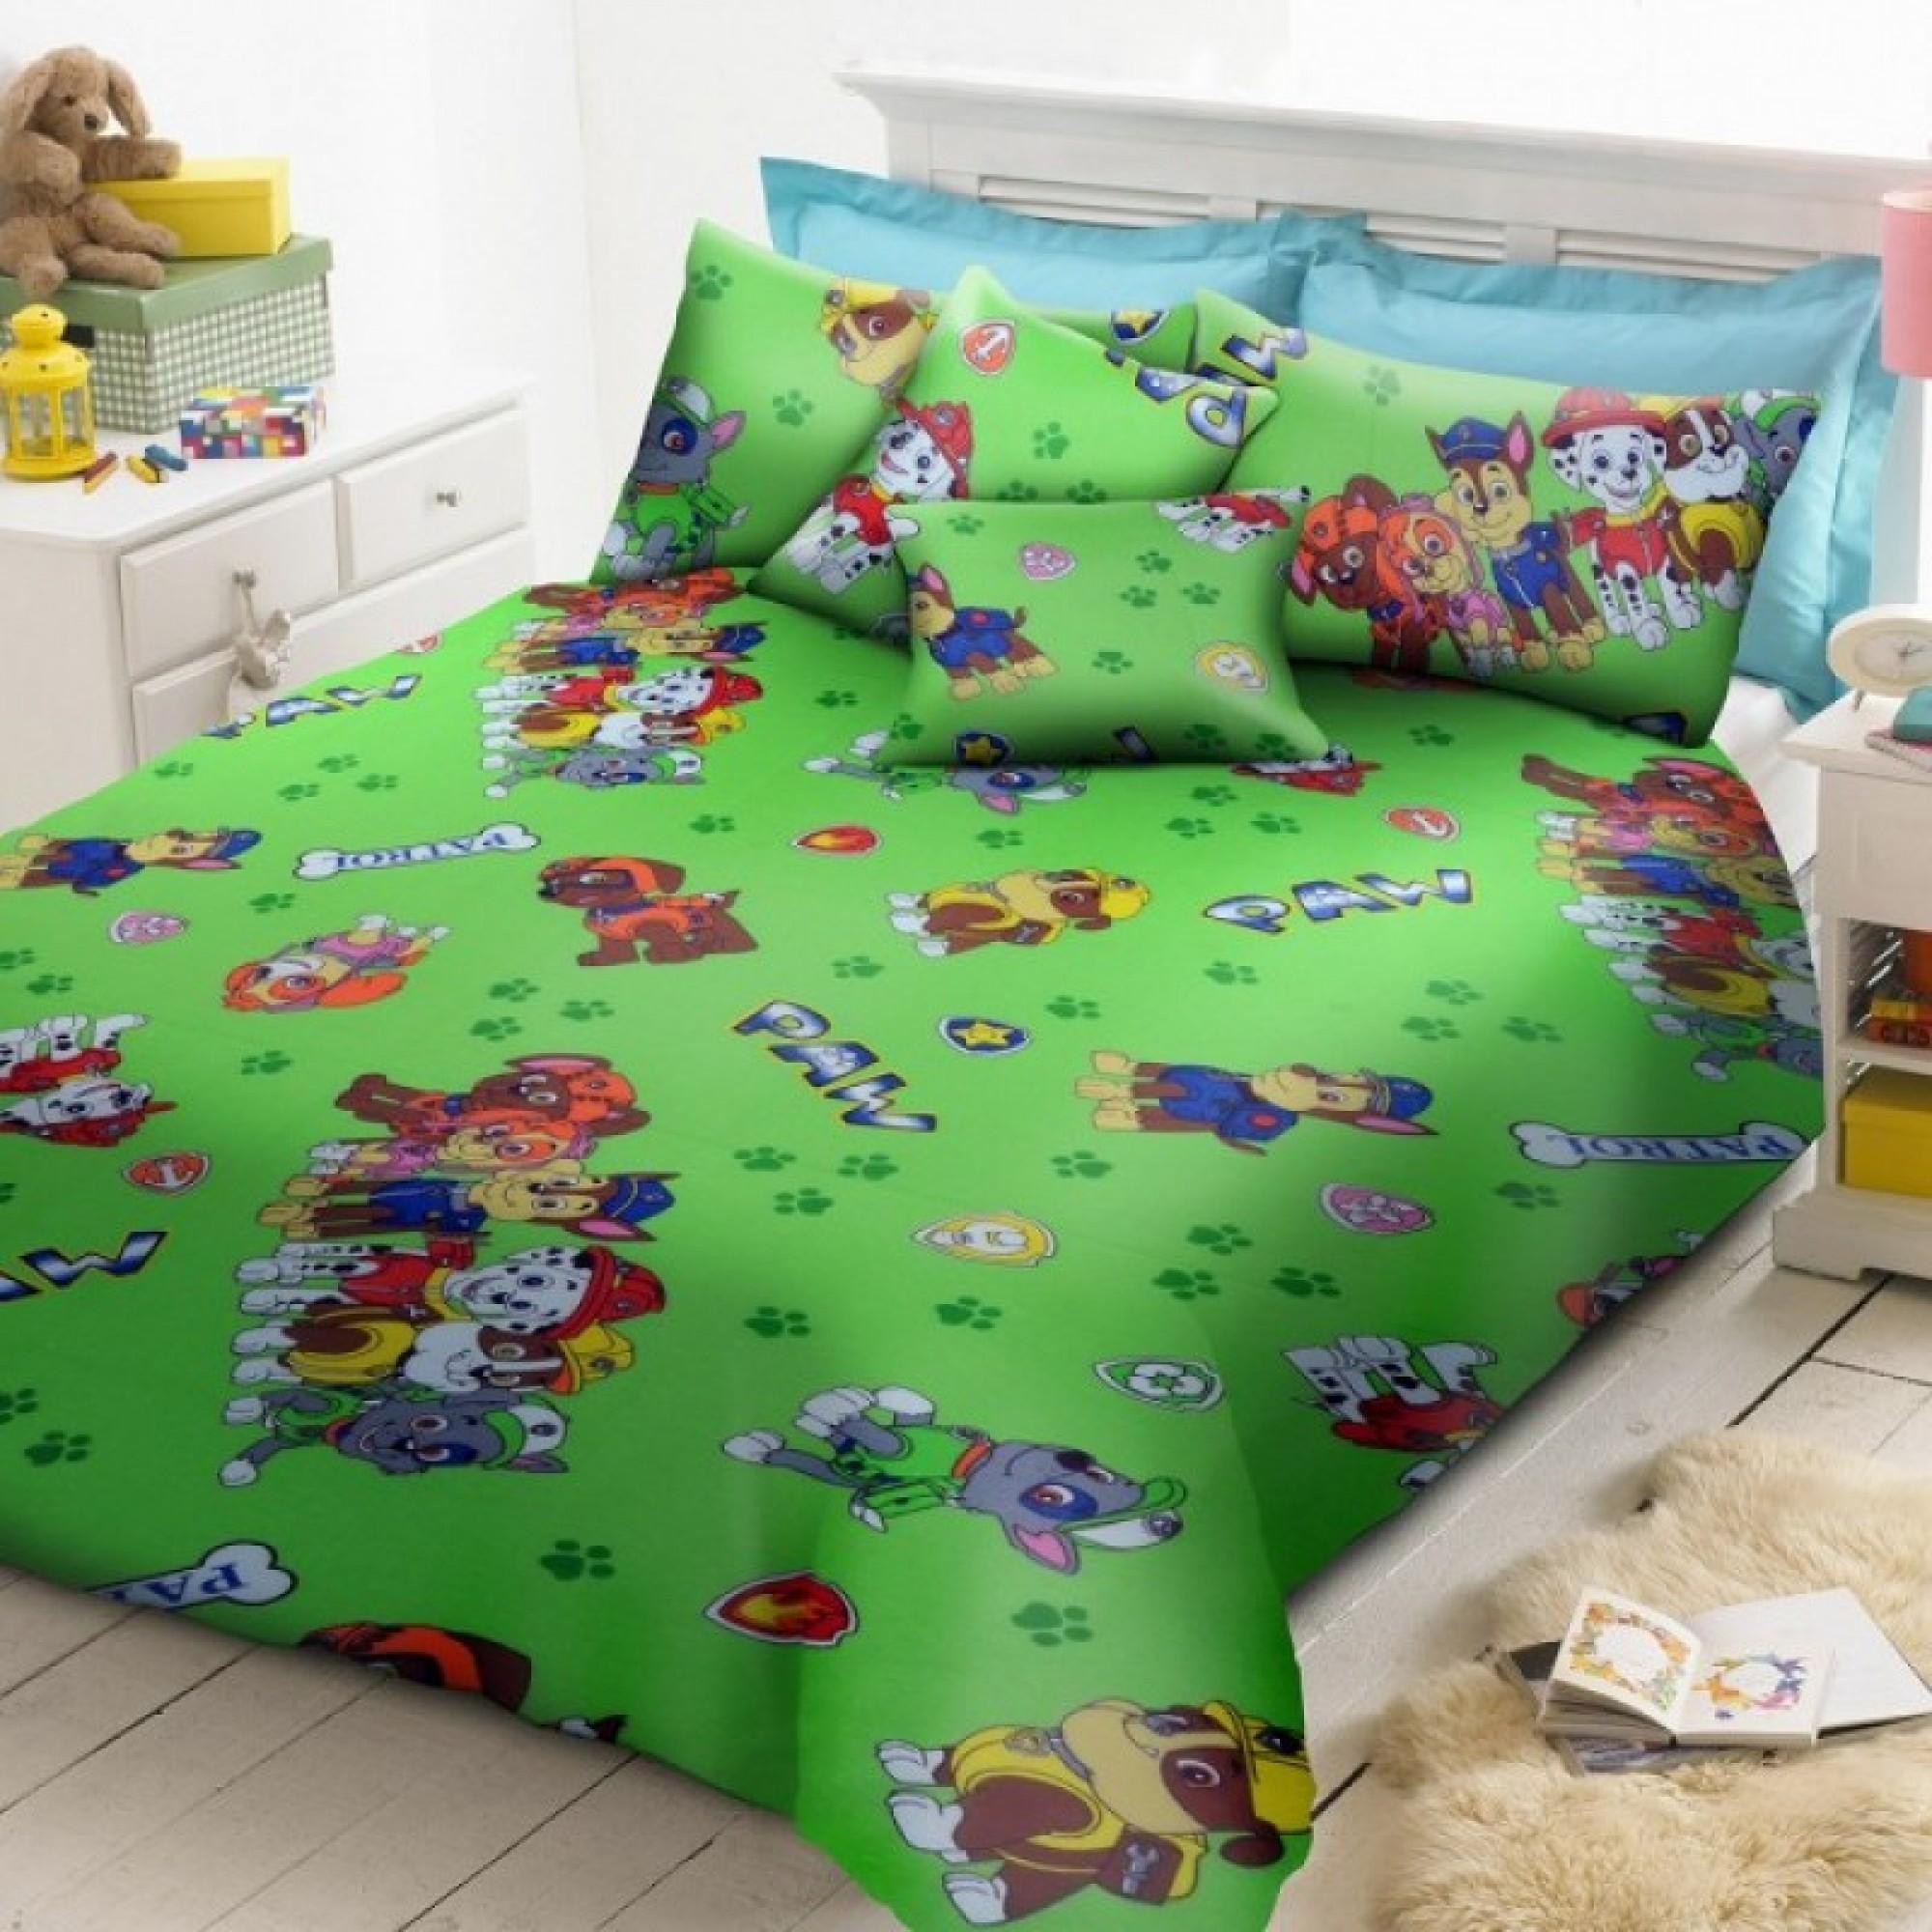 Детско спално бельо ПЕС ПАТРУЛ зелено  100% Памук